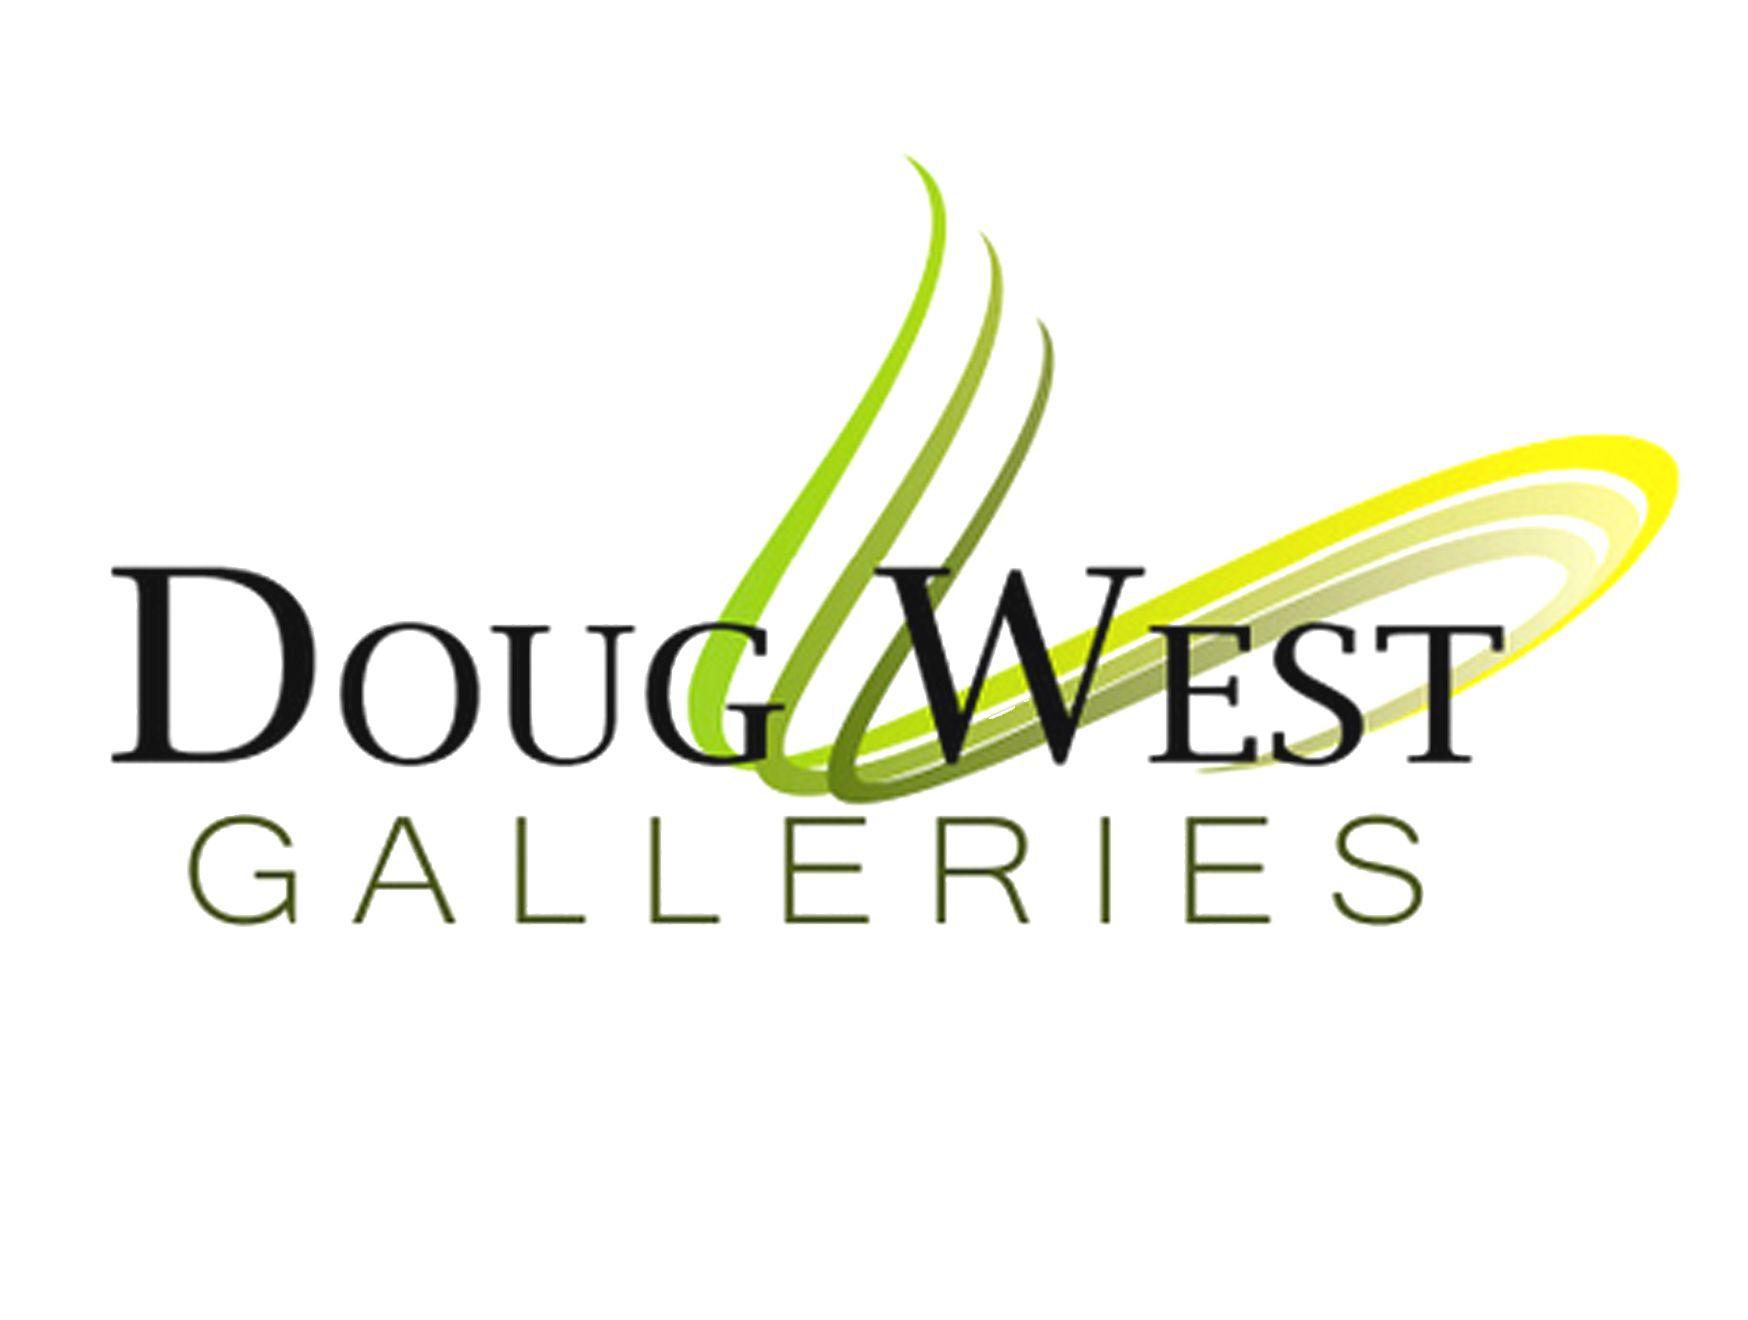 Doug West Galleries Logo